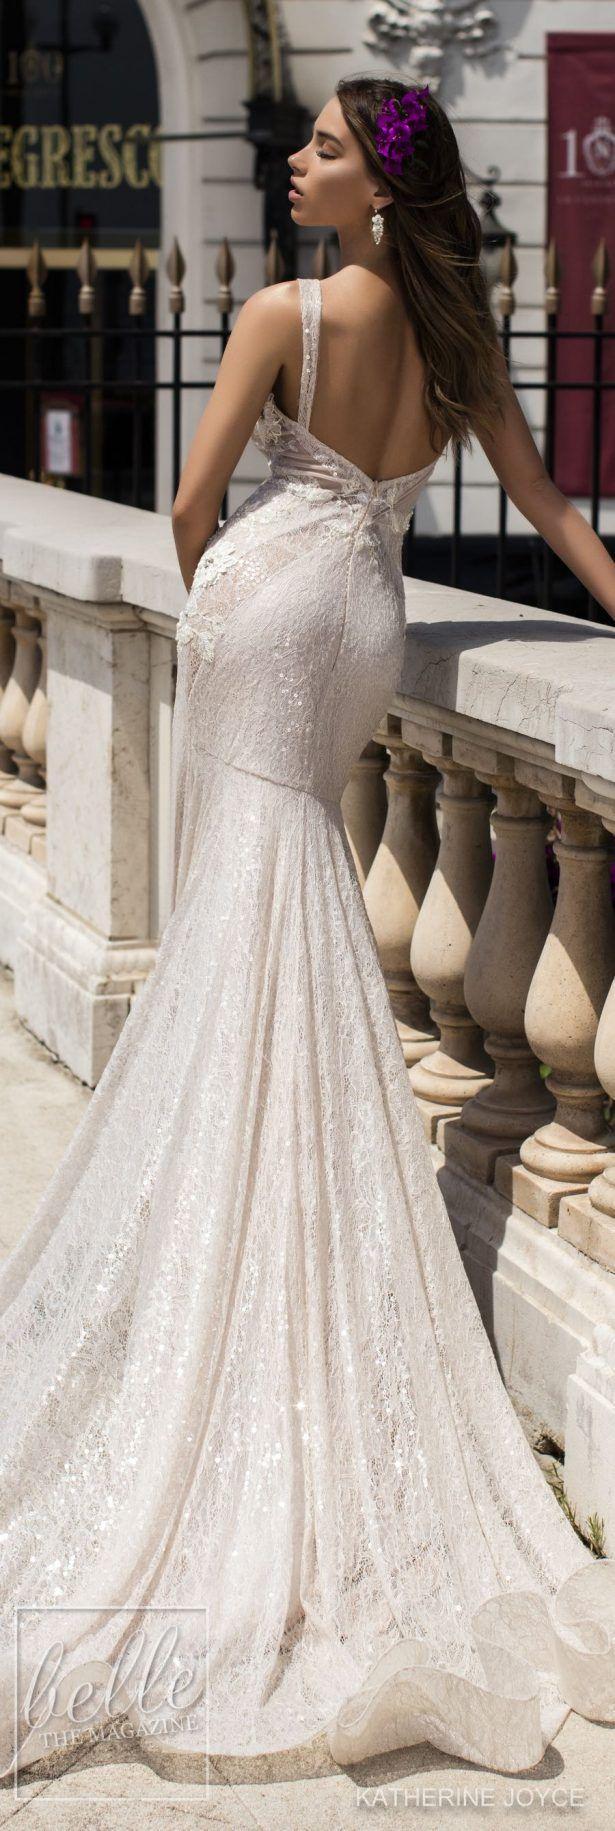 زفاف - Wedding Dresses By Katherine Joyce Bridal: Ma Cheri Collection 2018